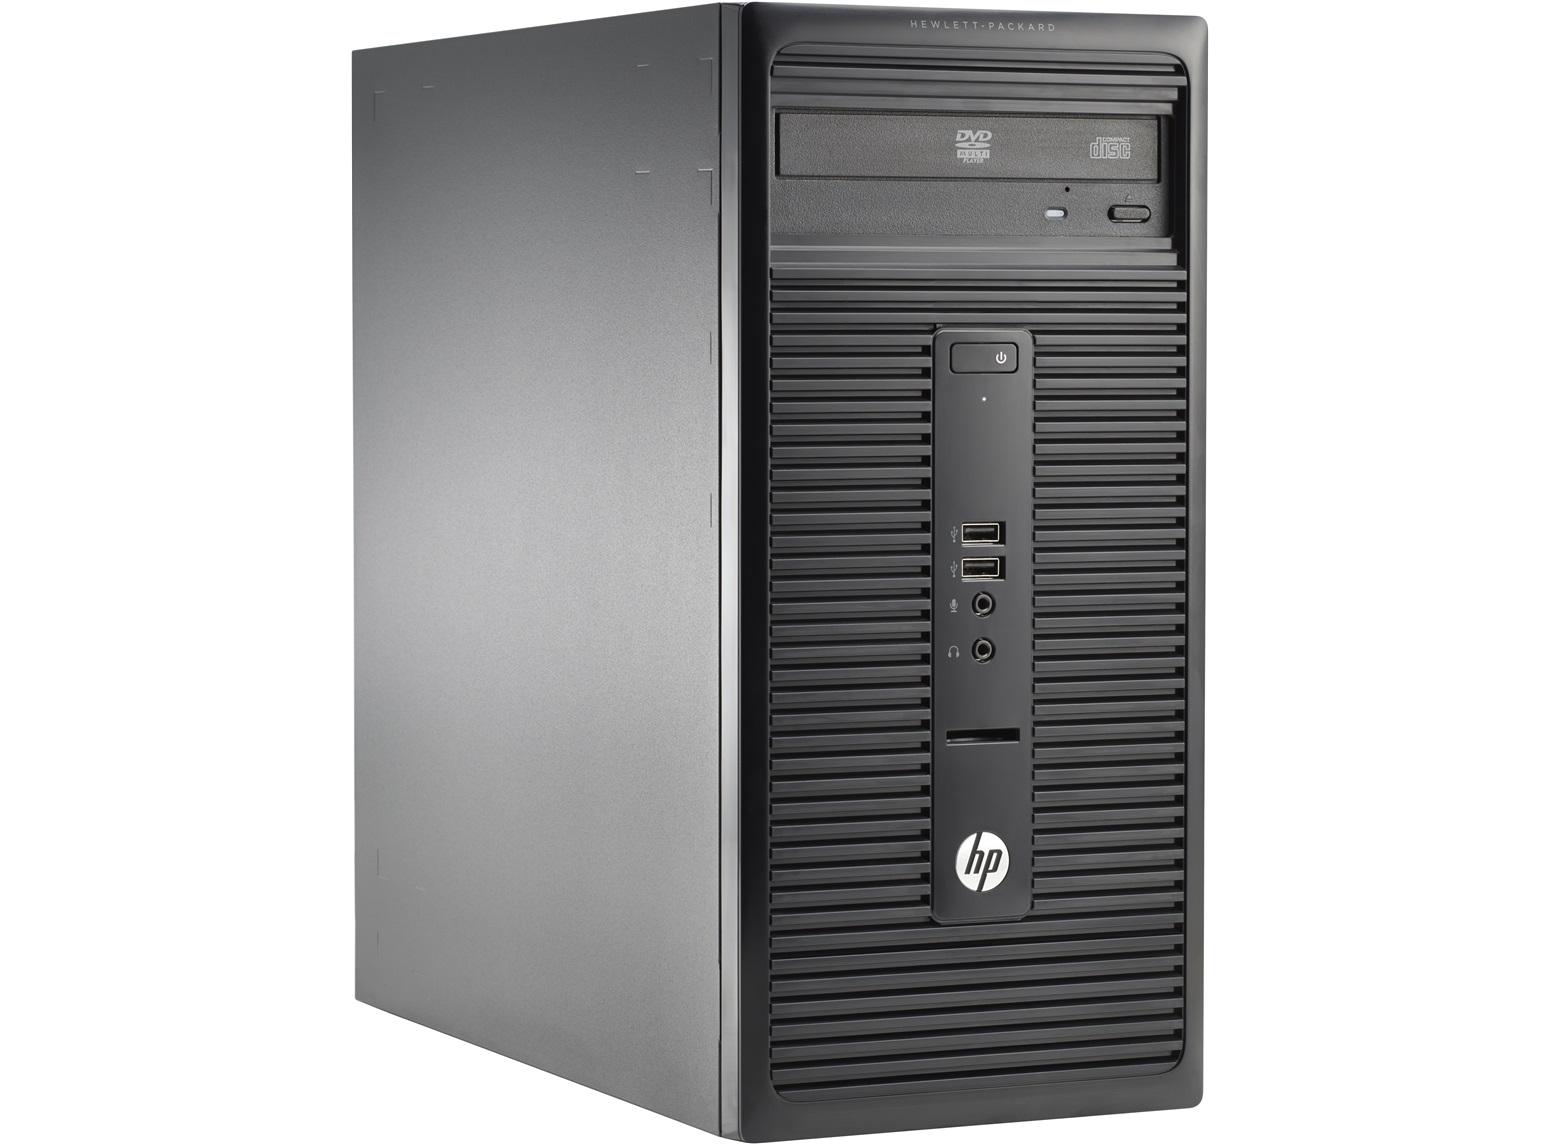 Máy bộ HP 280 G1 MT, Core i5-4590s/4GB/500GB (L1R07PT)